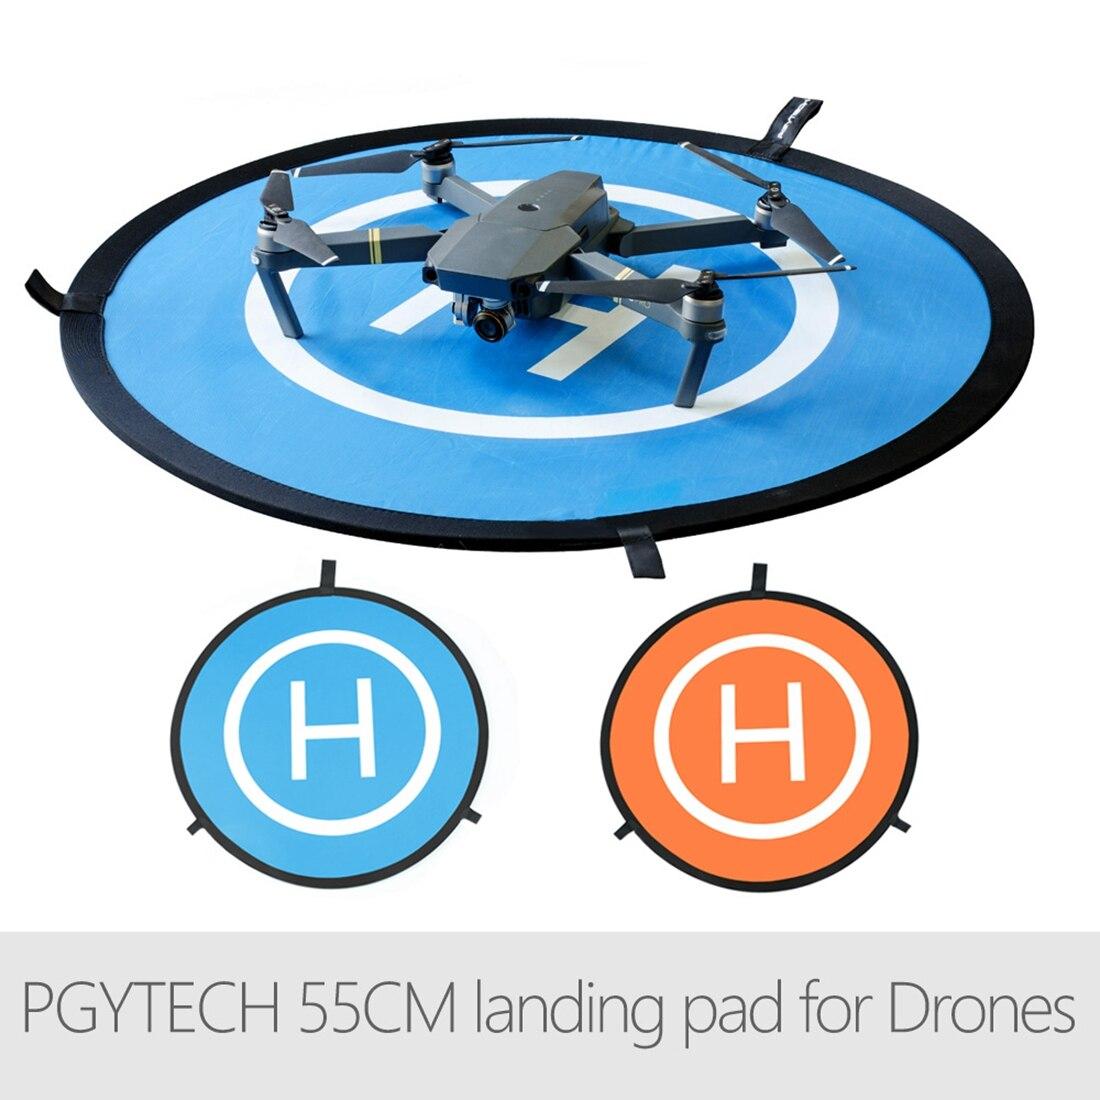 PGYTECH 55CM Fast-fold landing pad Extended Landing Gear Leg Extension LED Headlight set for DJI Mavic Pro